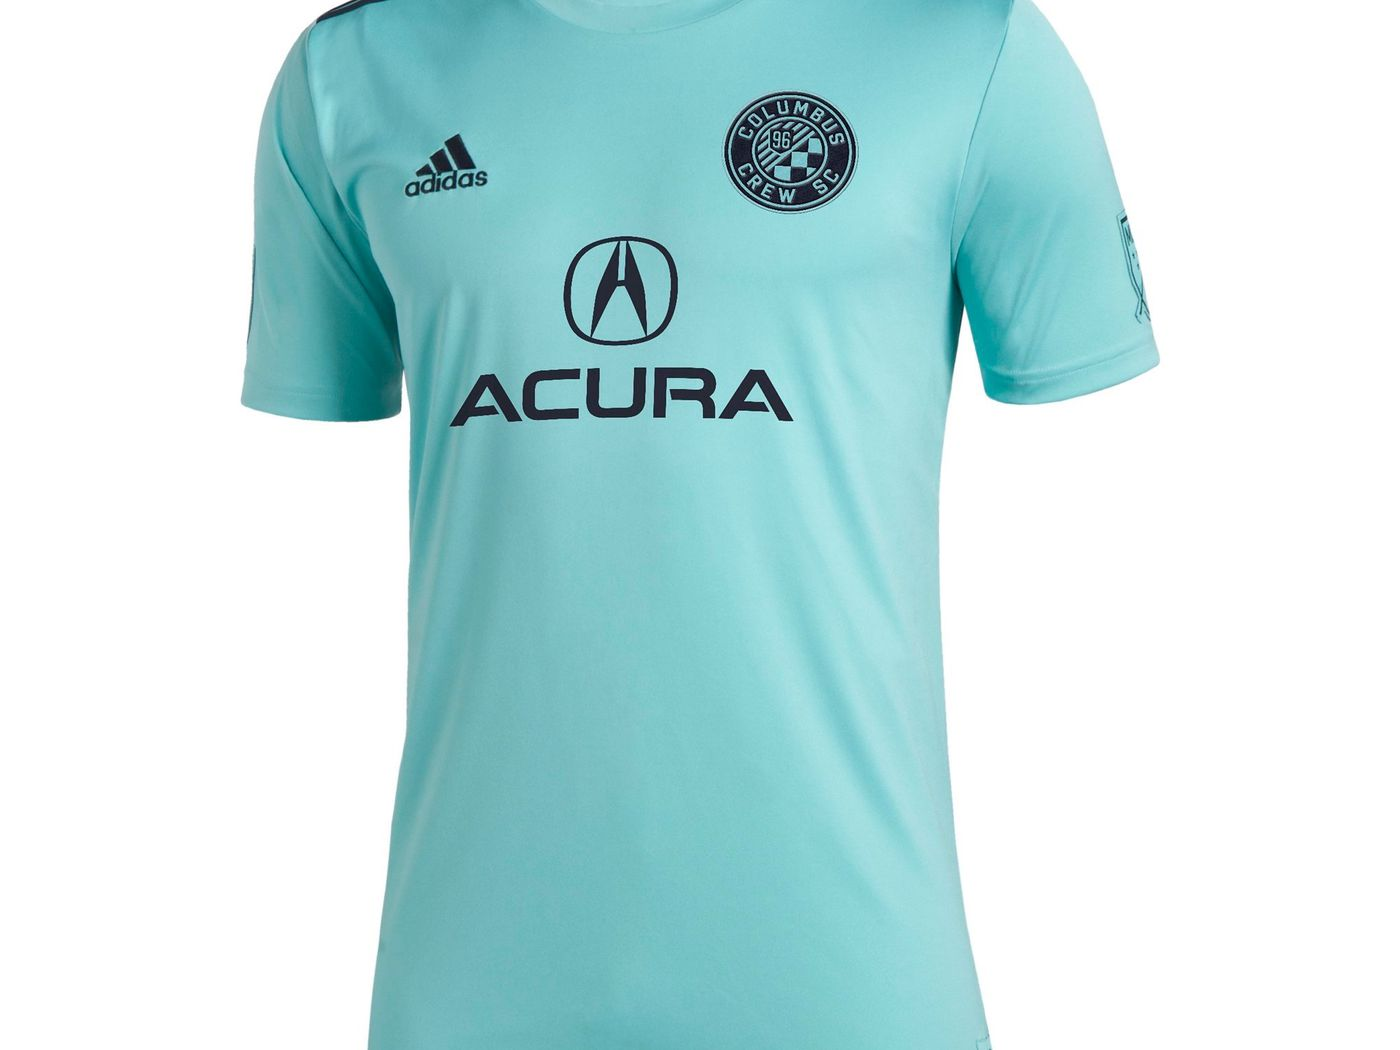 Columbus Crew unveils 2019 Adidas parley jerseys - Massive Report